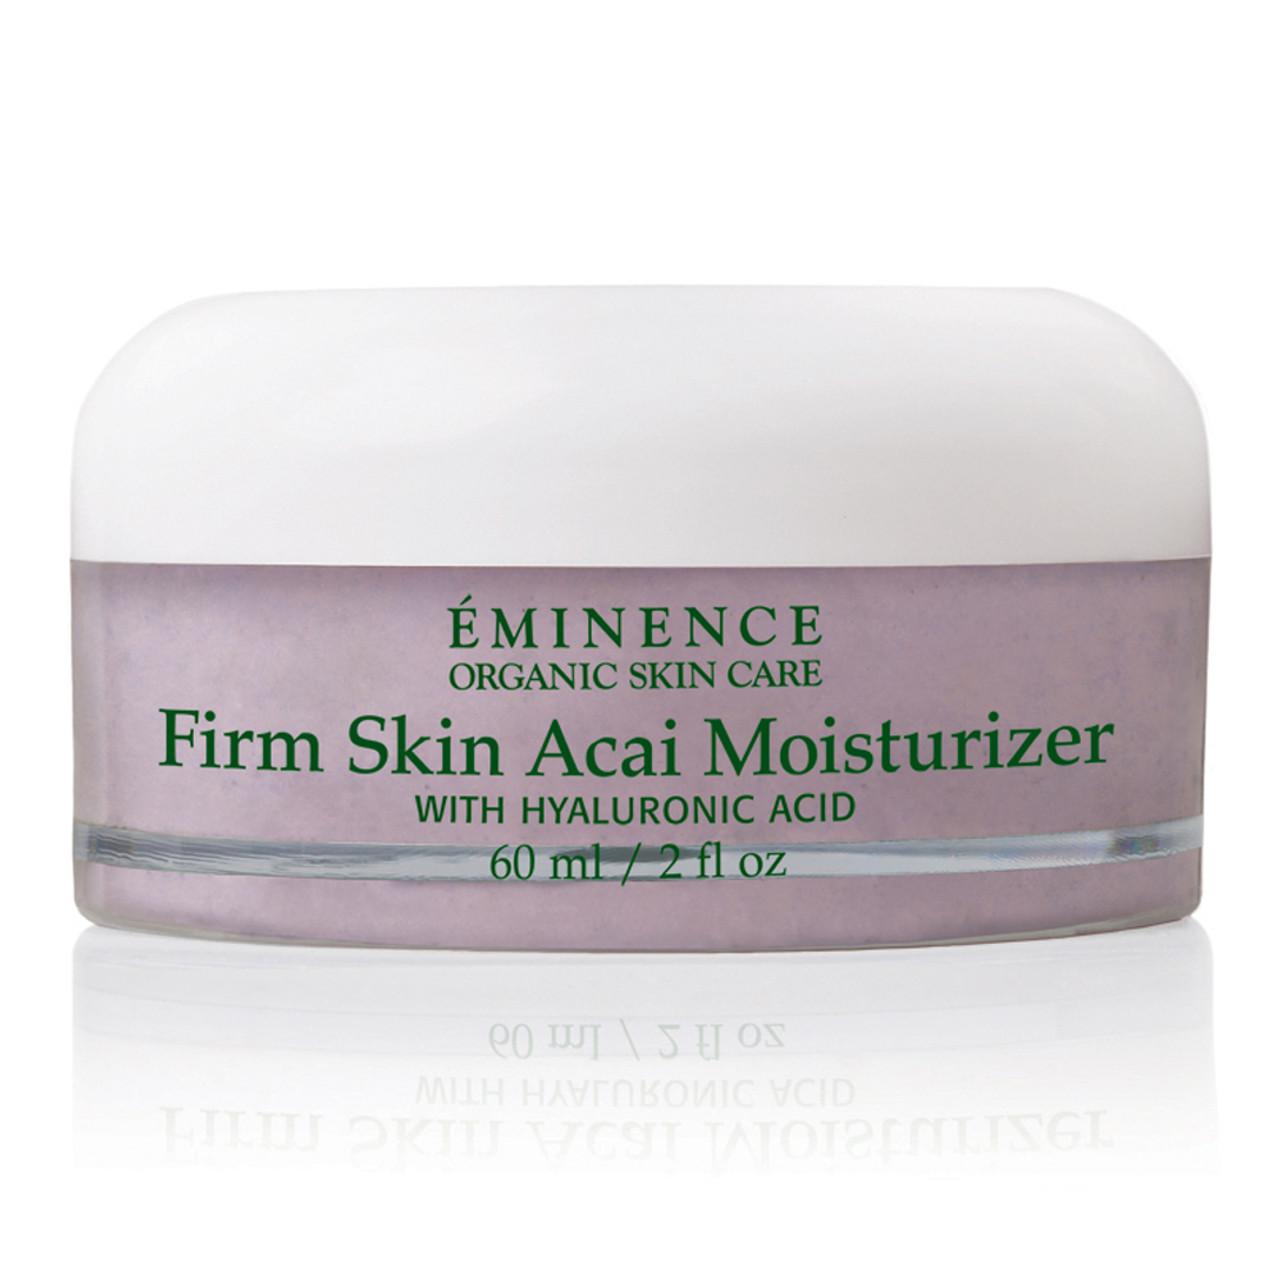 Eminence Firm Skin Acai Moisturizer BeautifiedYou.com